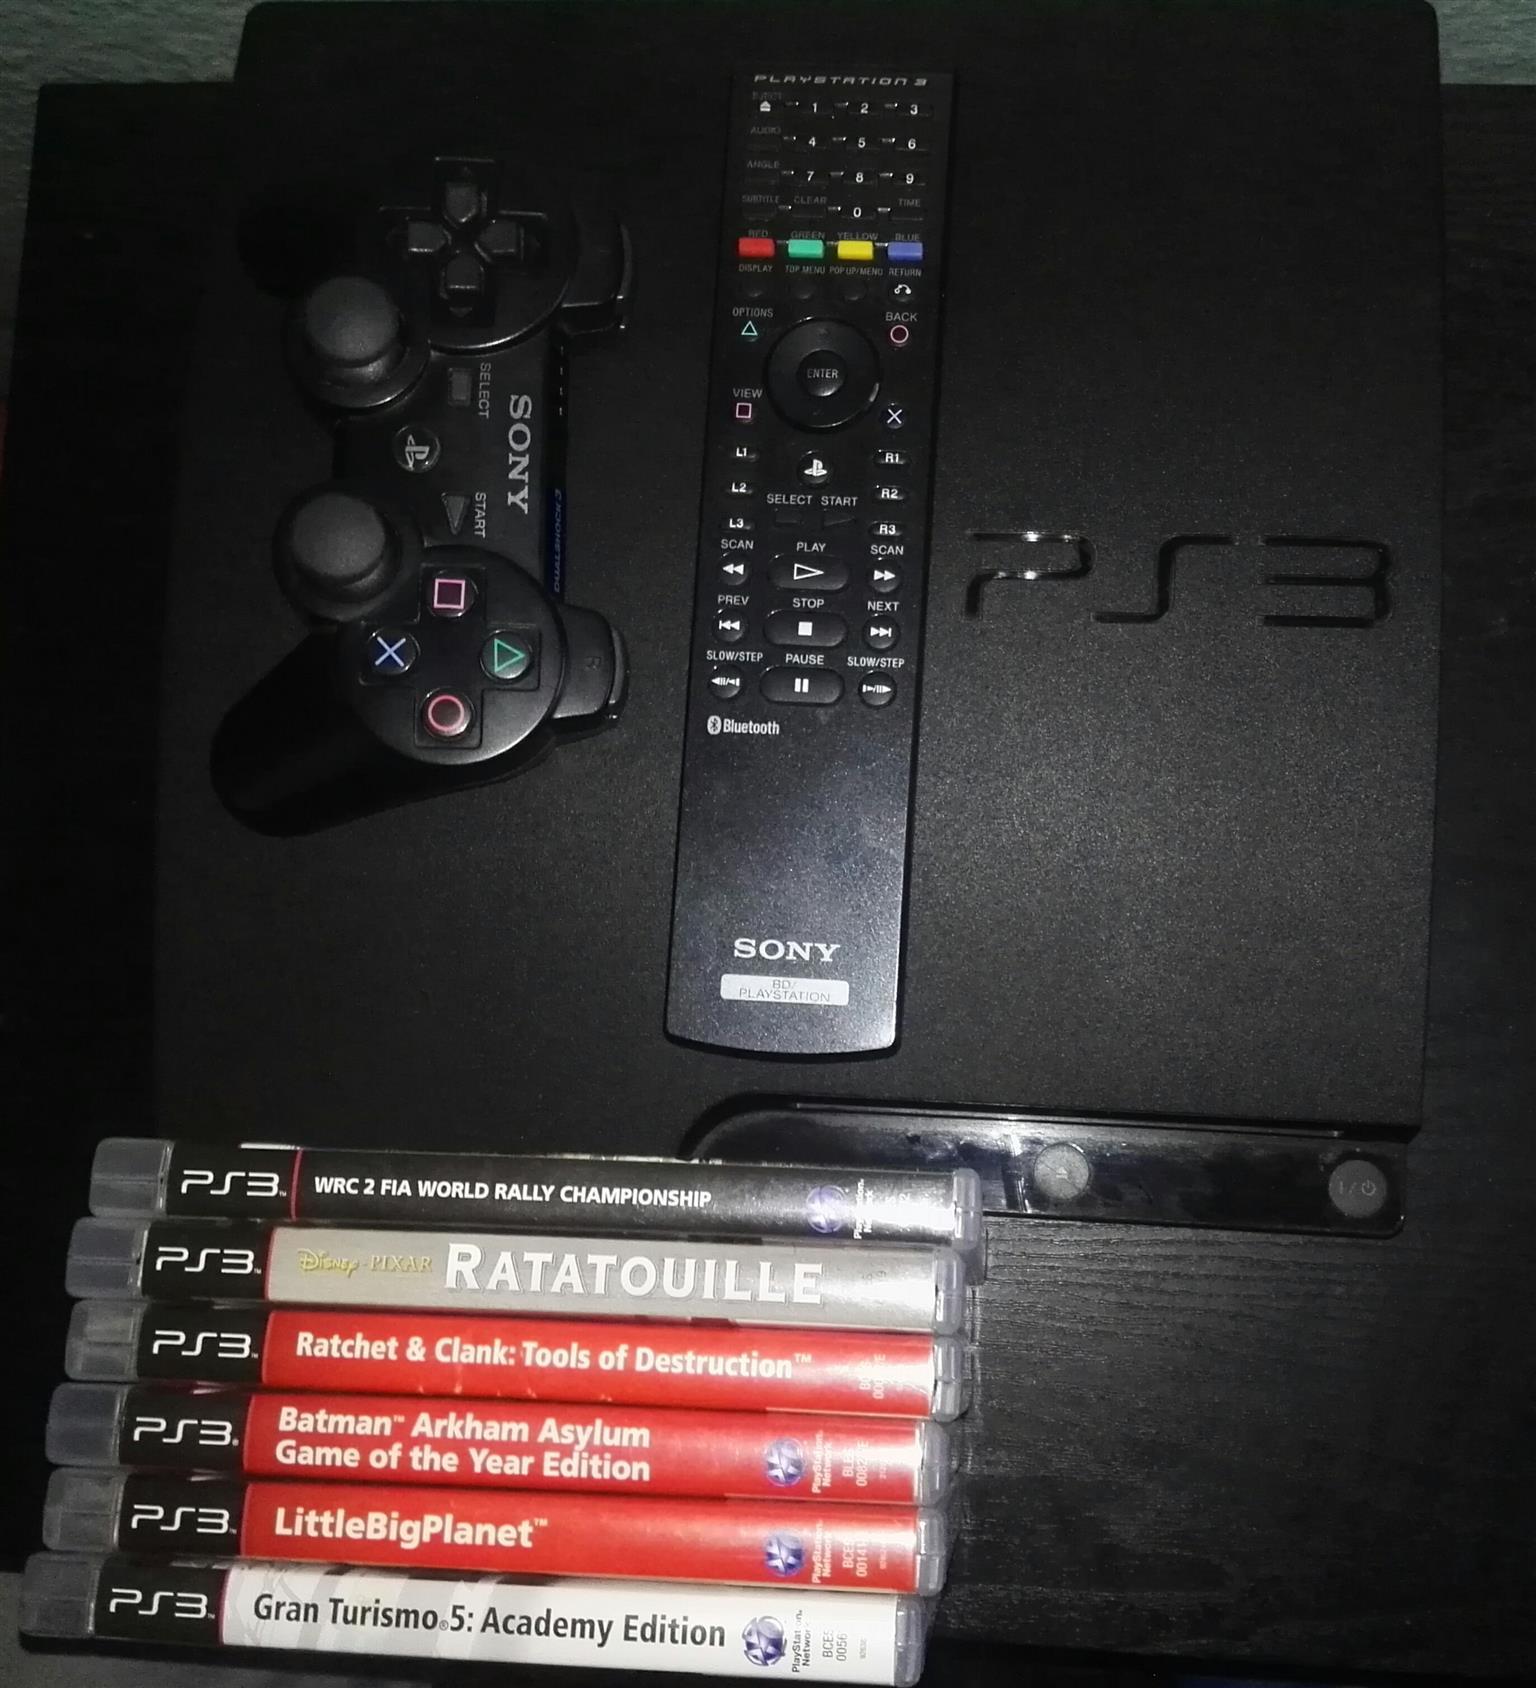 320GB PS3 Slim